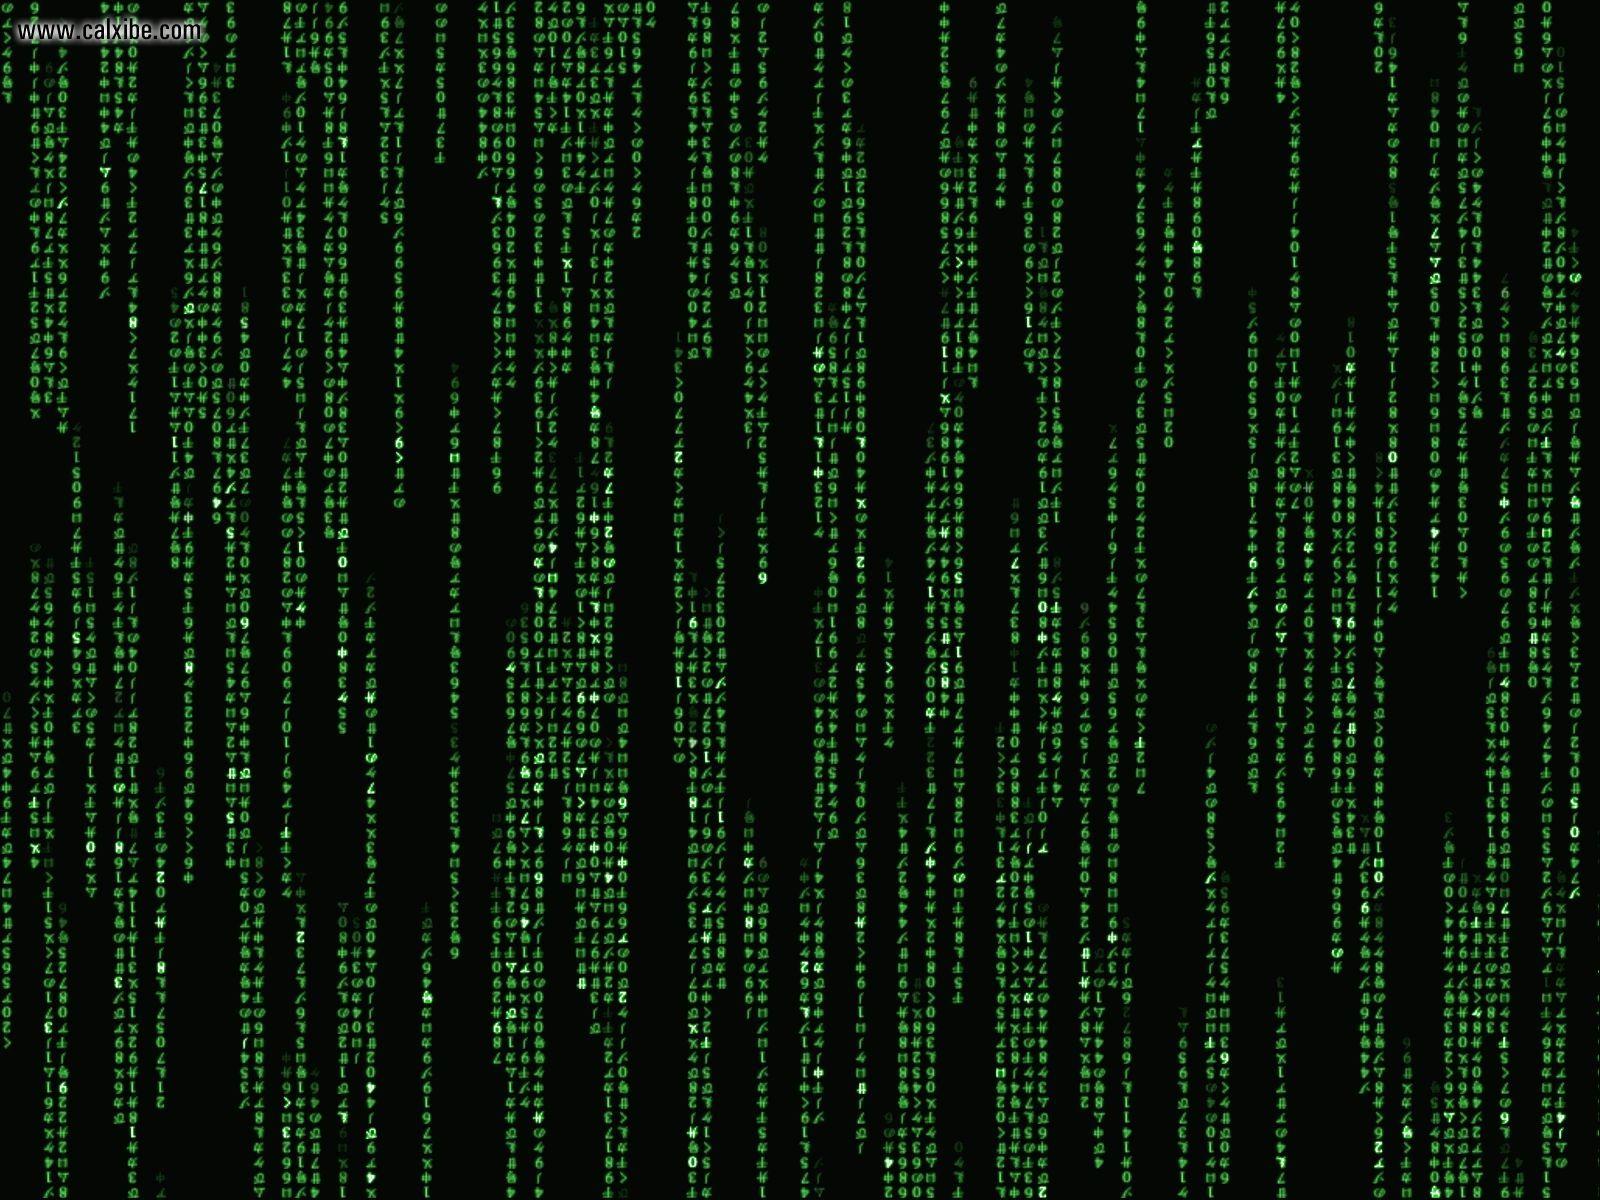 Matrix Code Miscellaneous 1600x1200